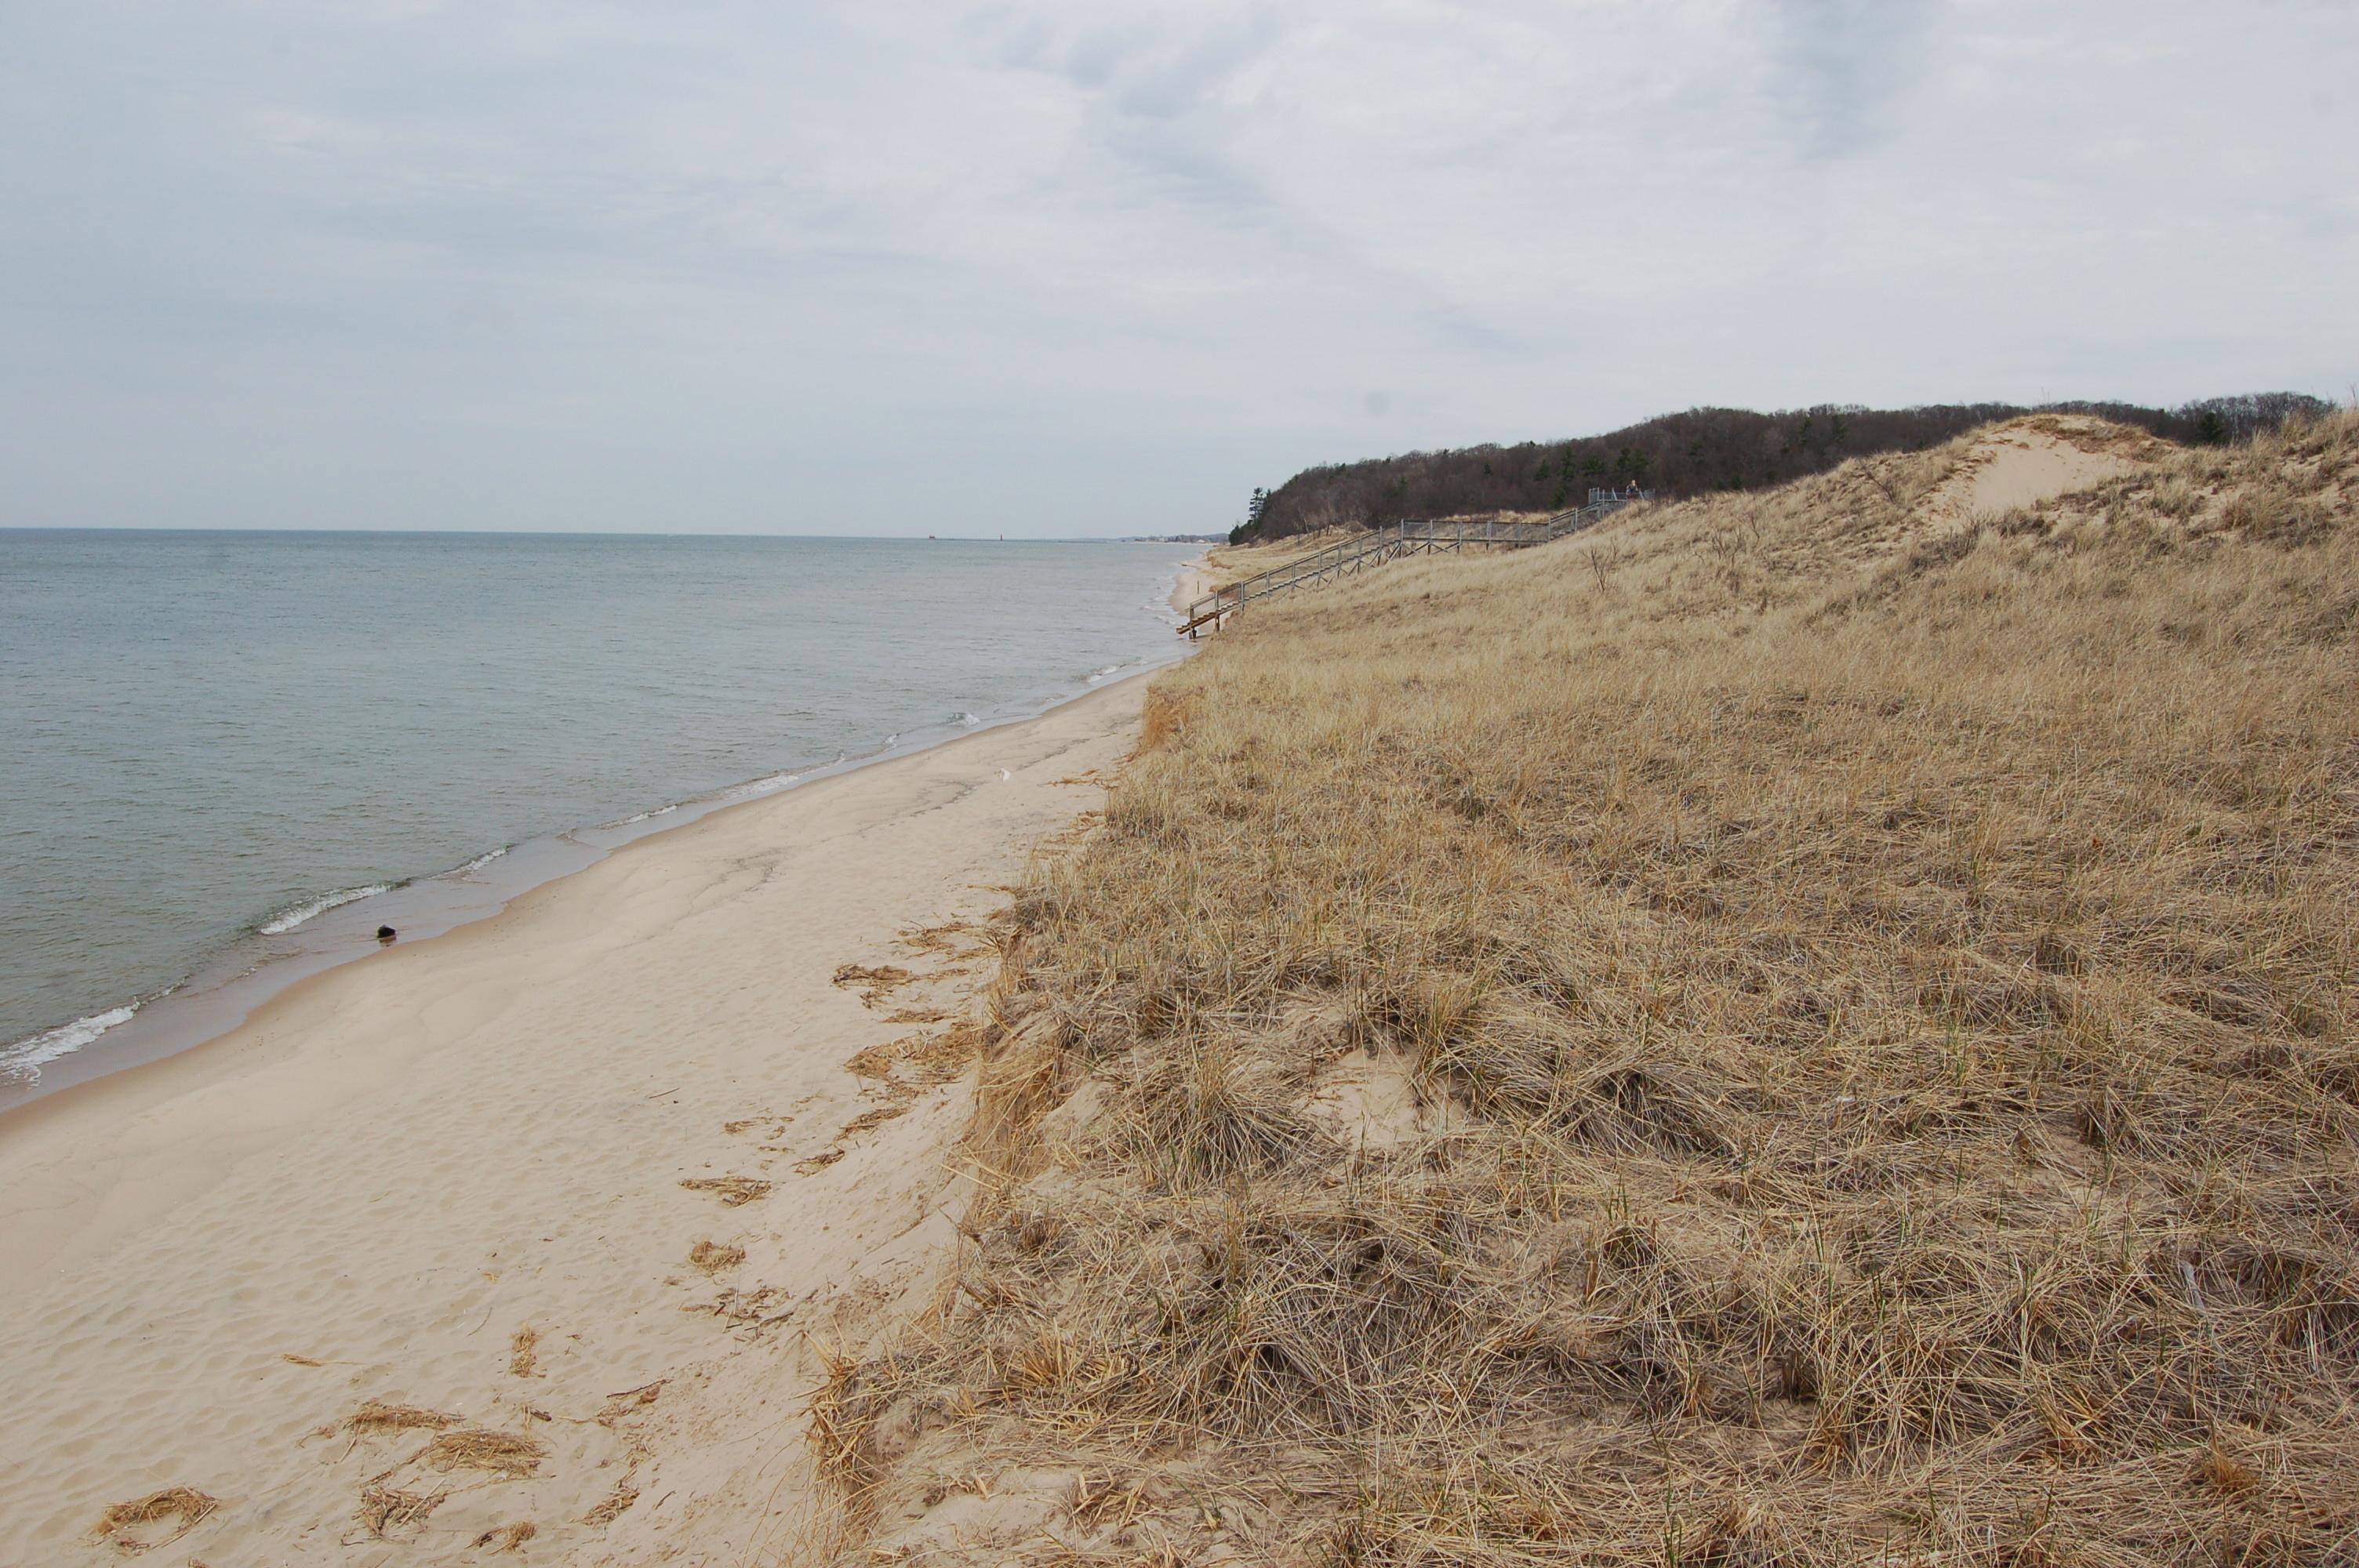 Rosy Mound Dunegrass